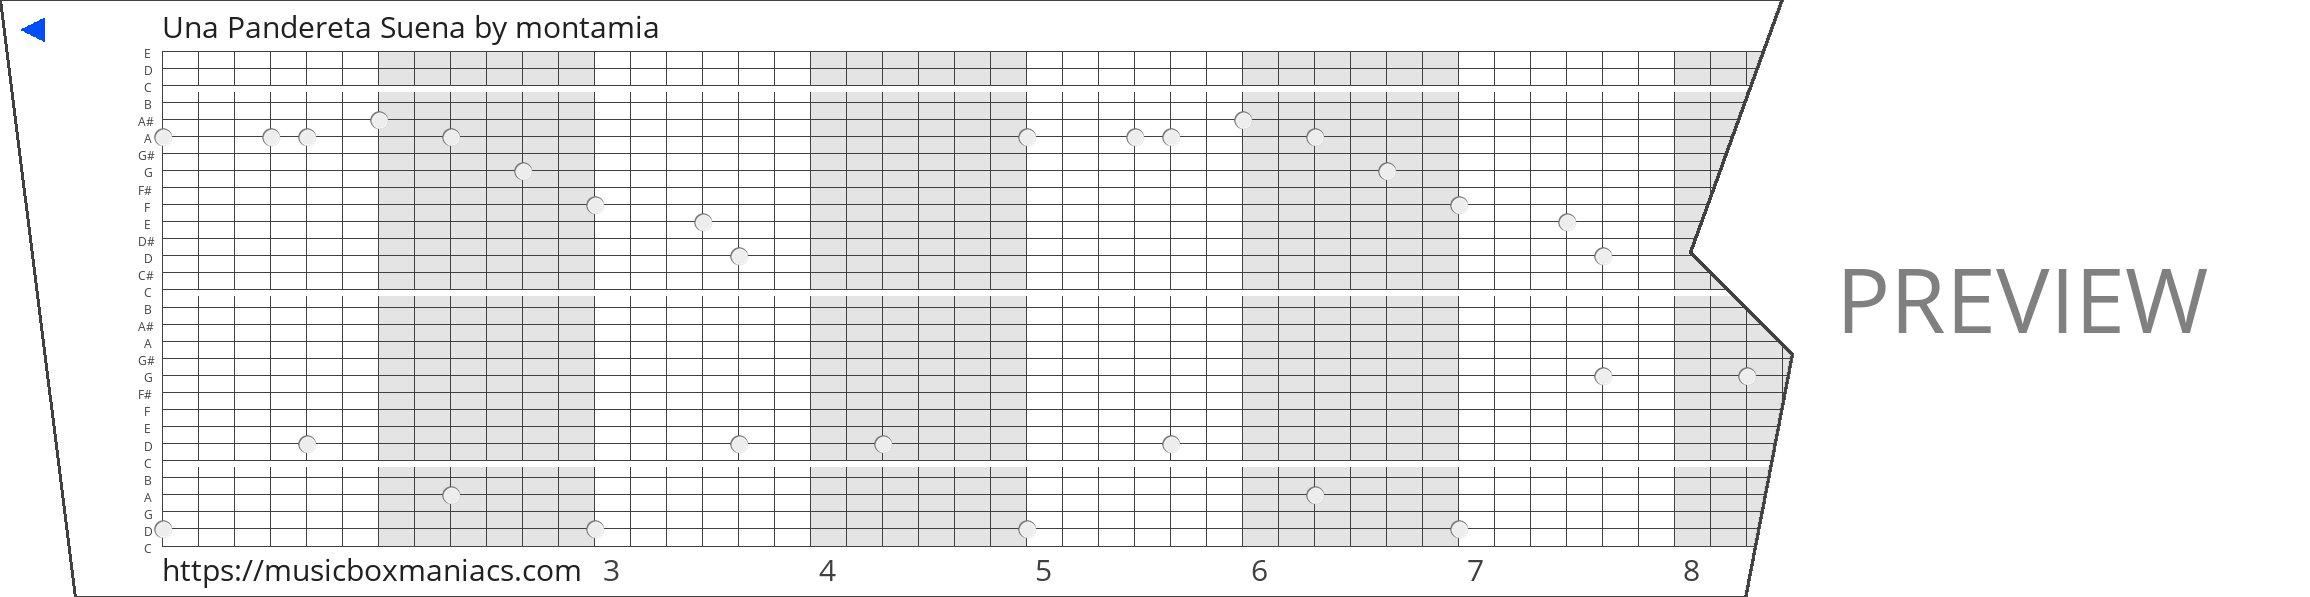 Una Pandereta Suena 30 note music box paper strip